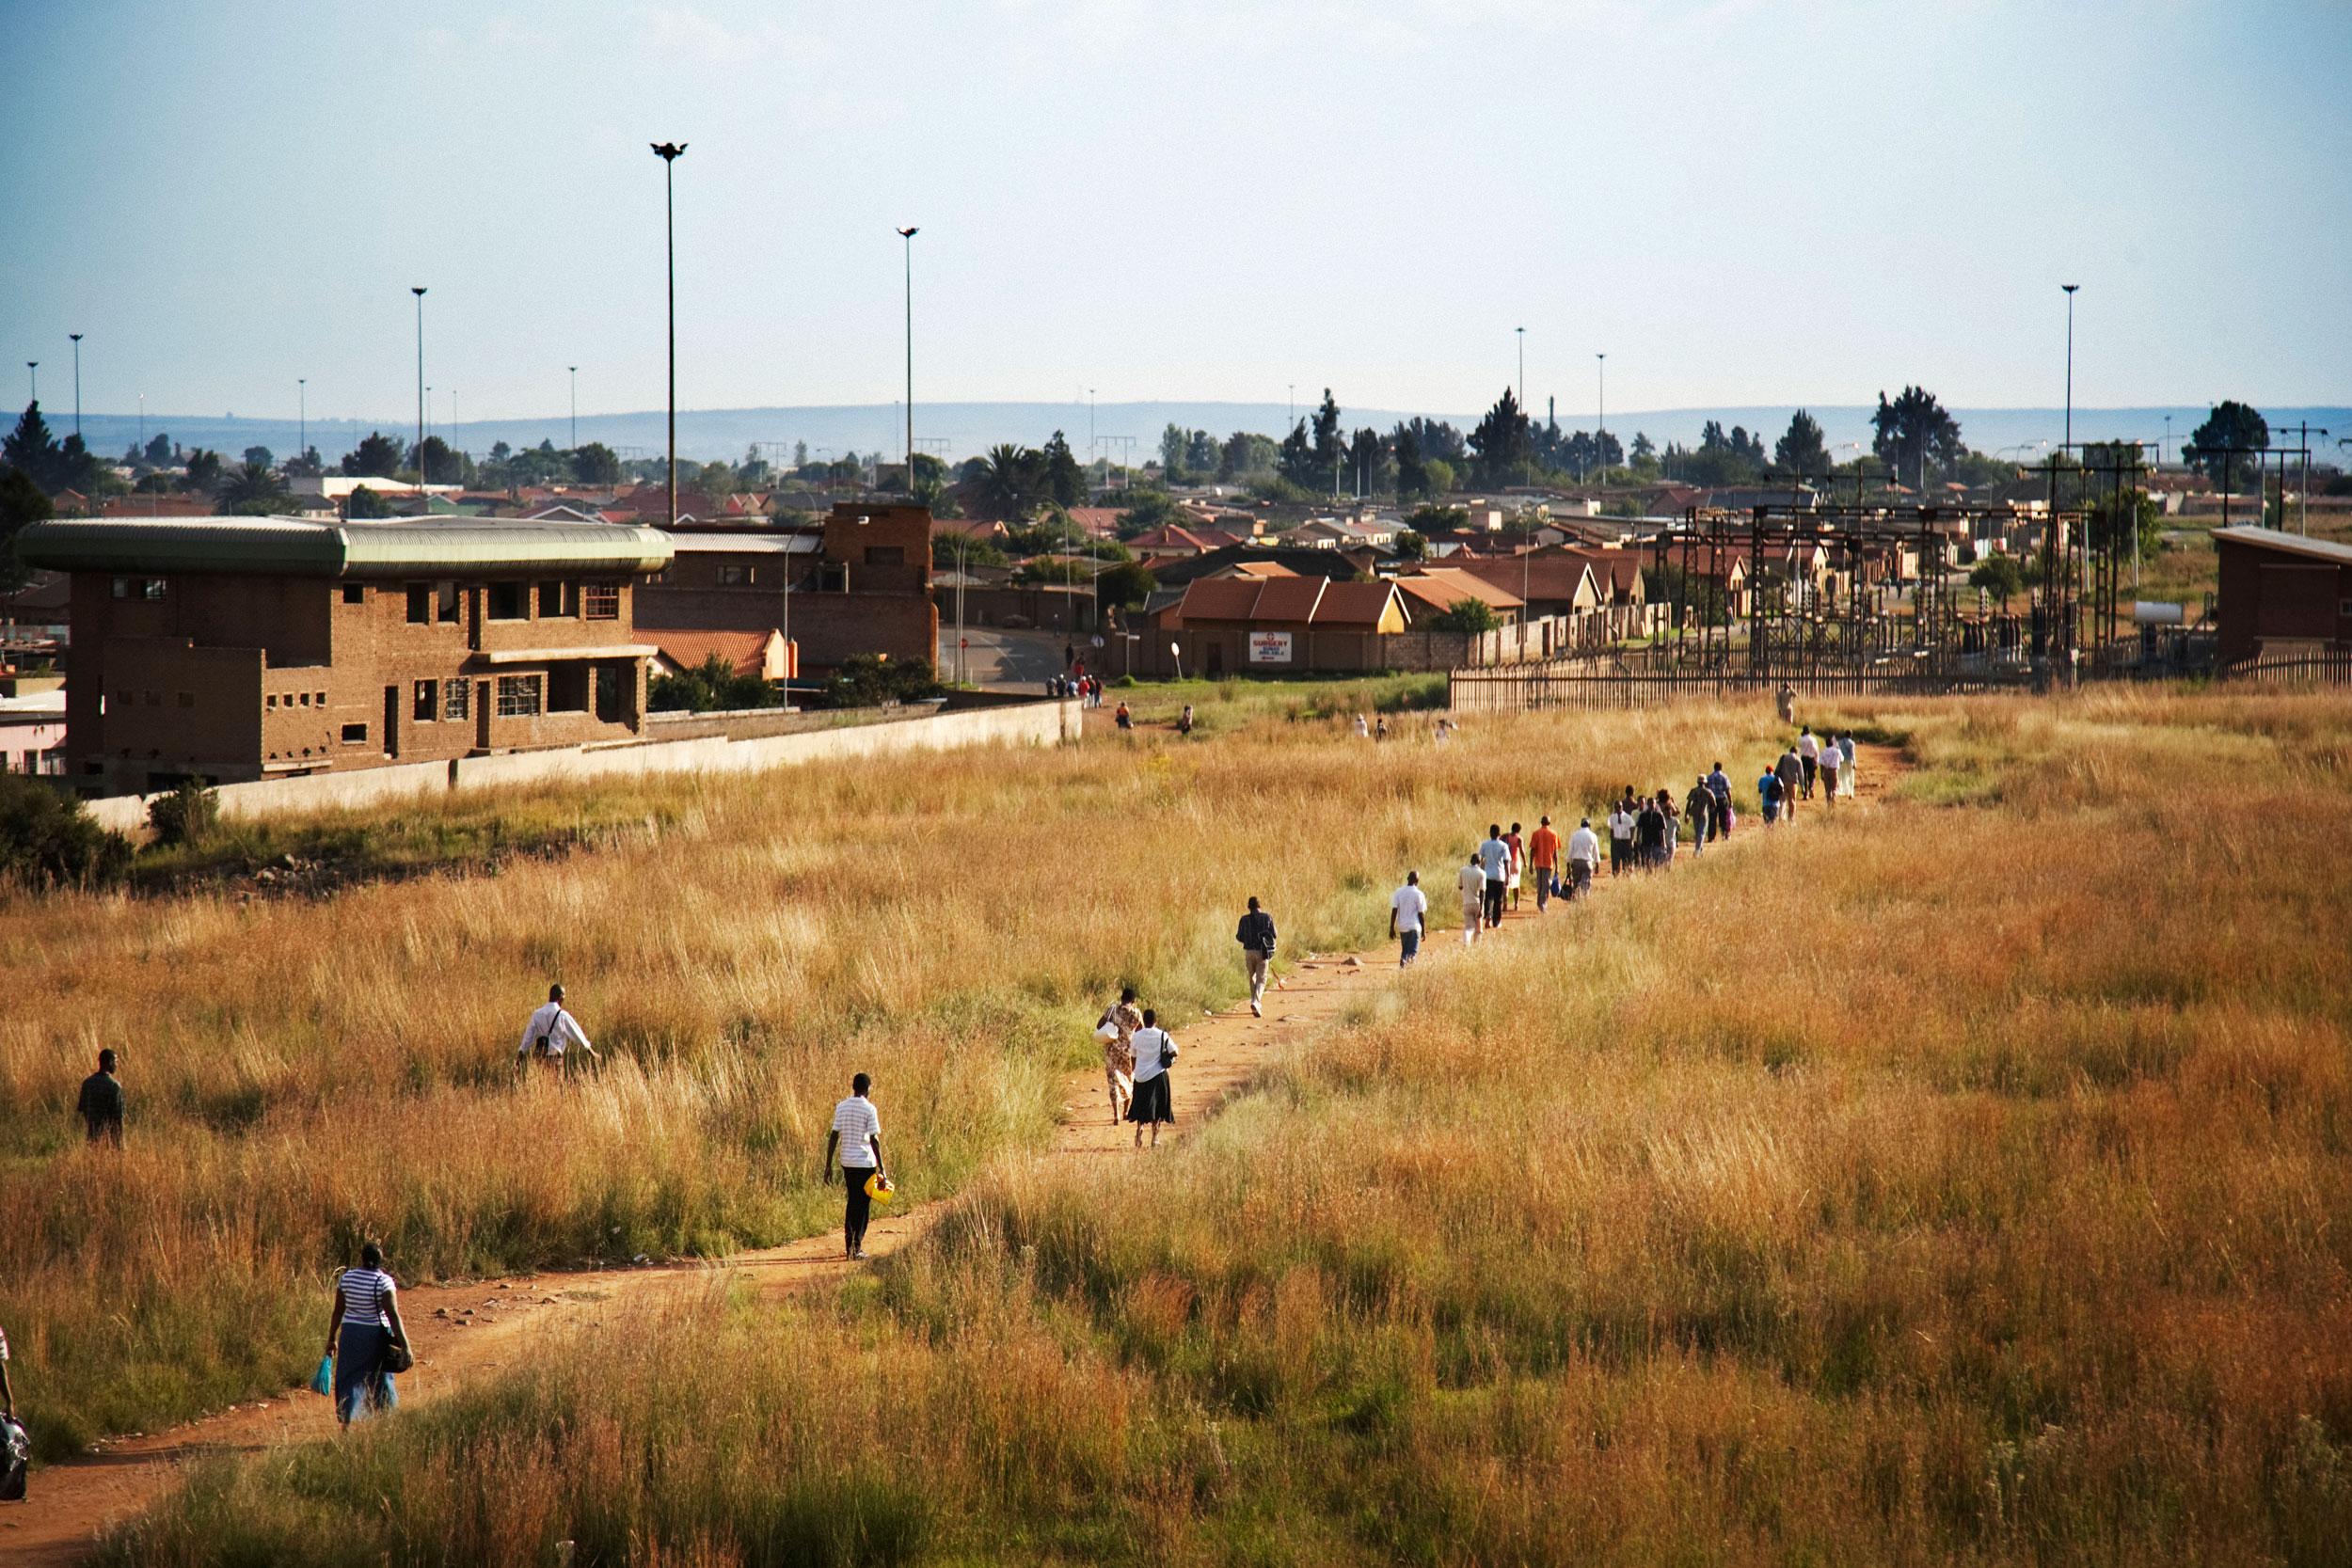 20070124_Soweto_B8T1153.jpg